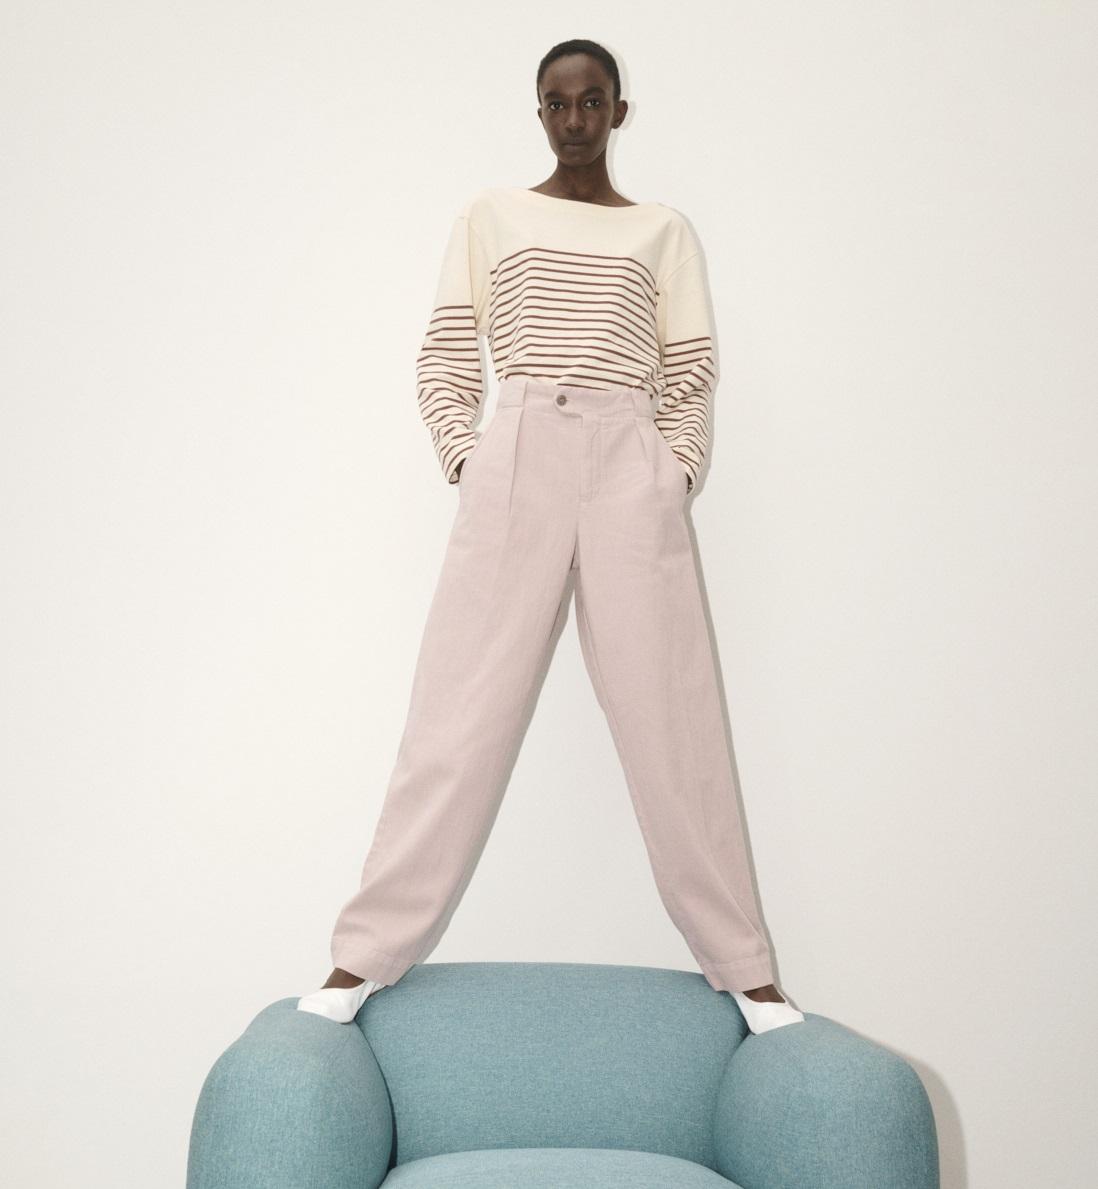 Model trägt  rosa Hose und gestreifter Pullover aus der CLOSED Kollektion HW21